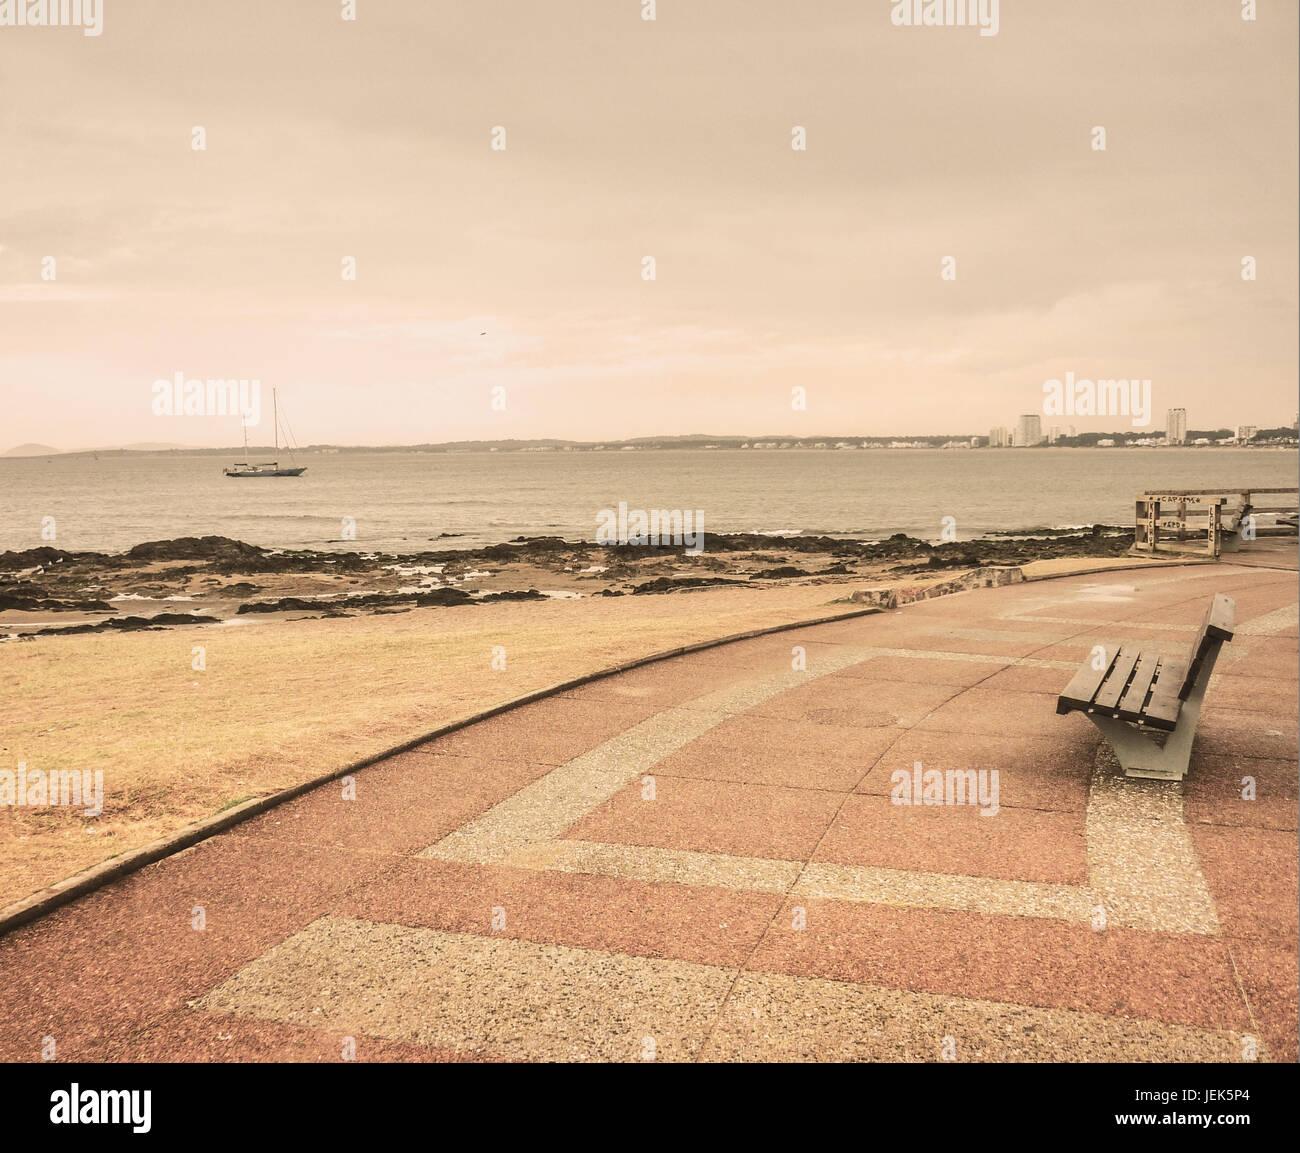 Lonely Boardwalk in Punta del Este Stock Photo